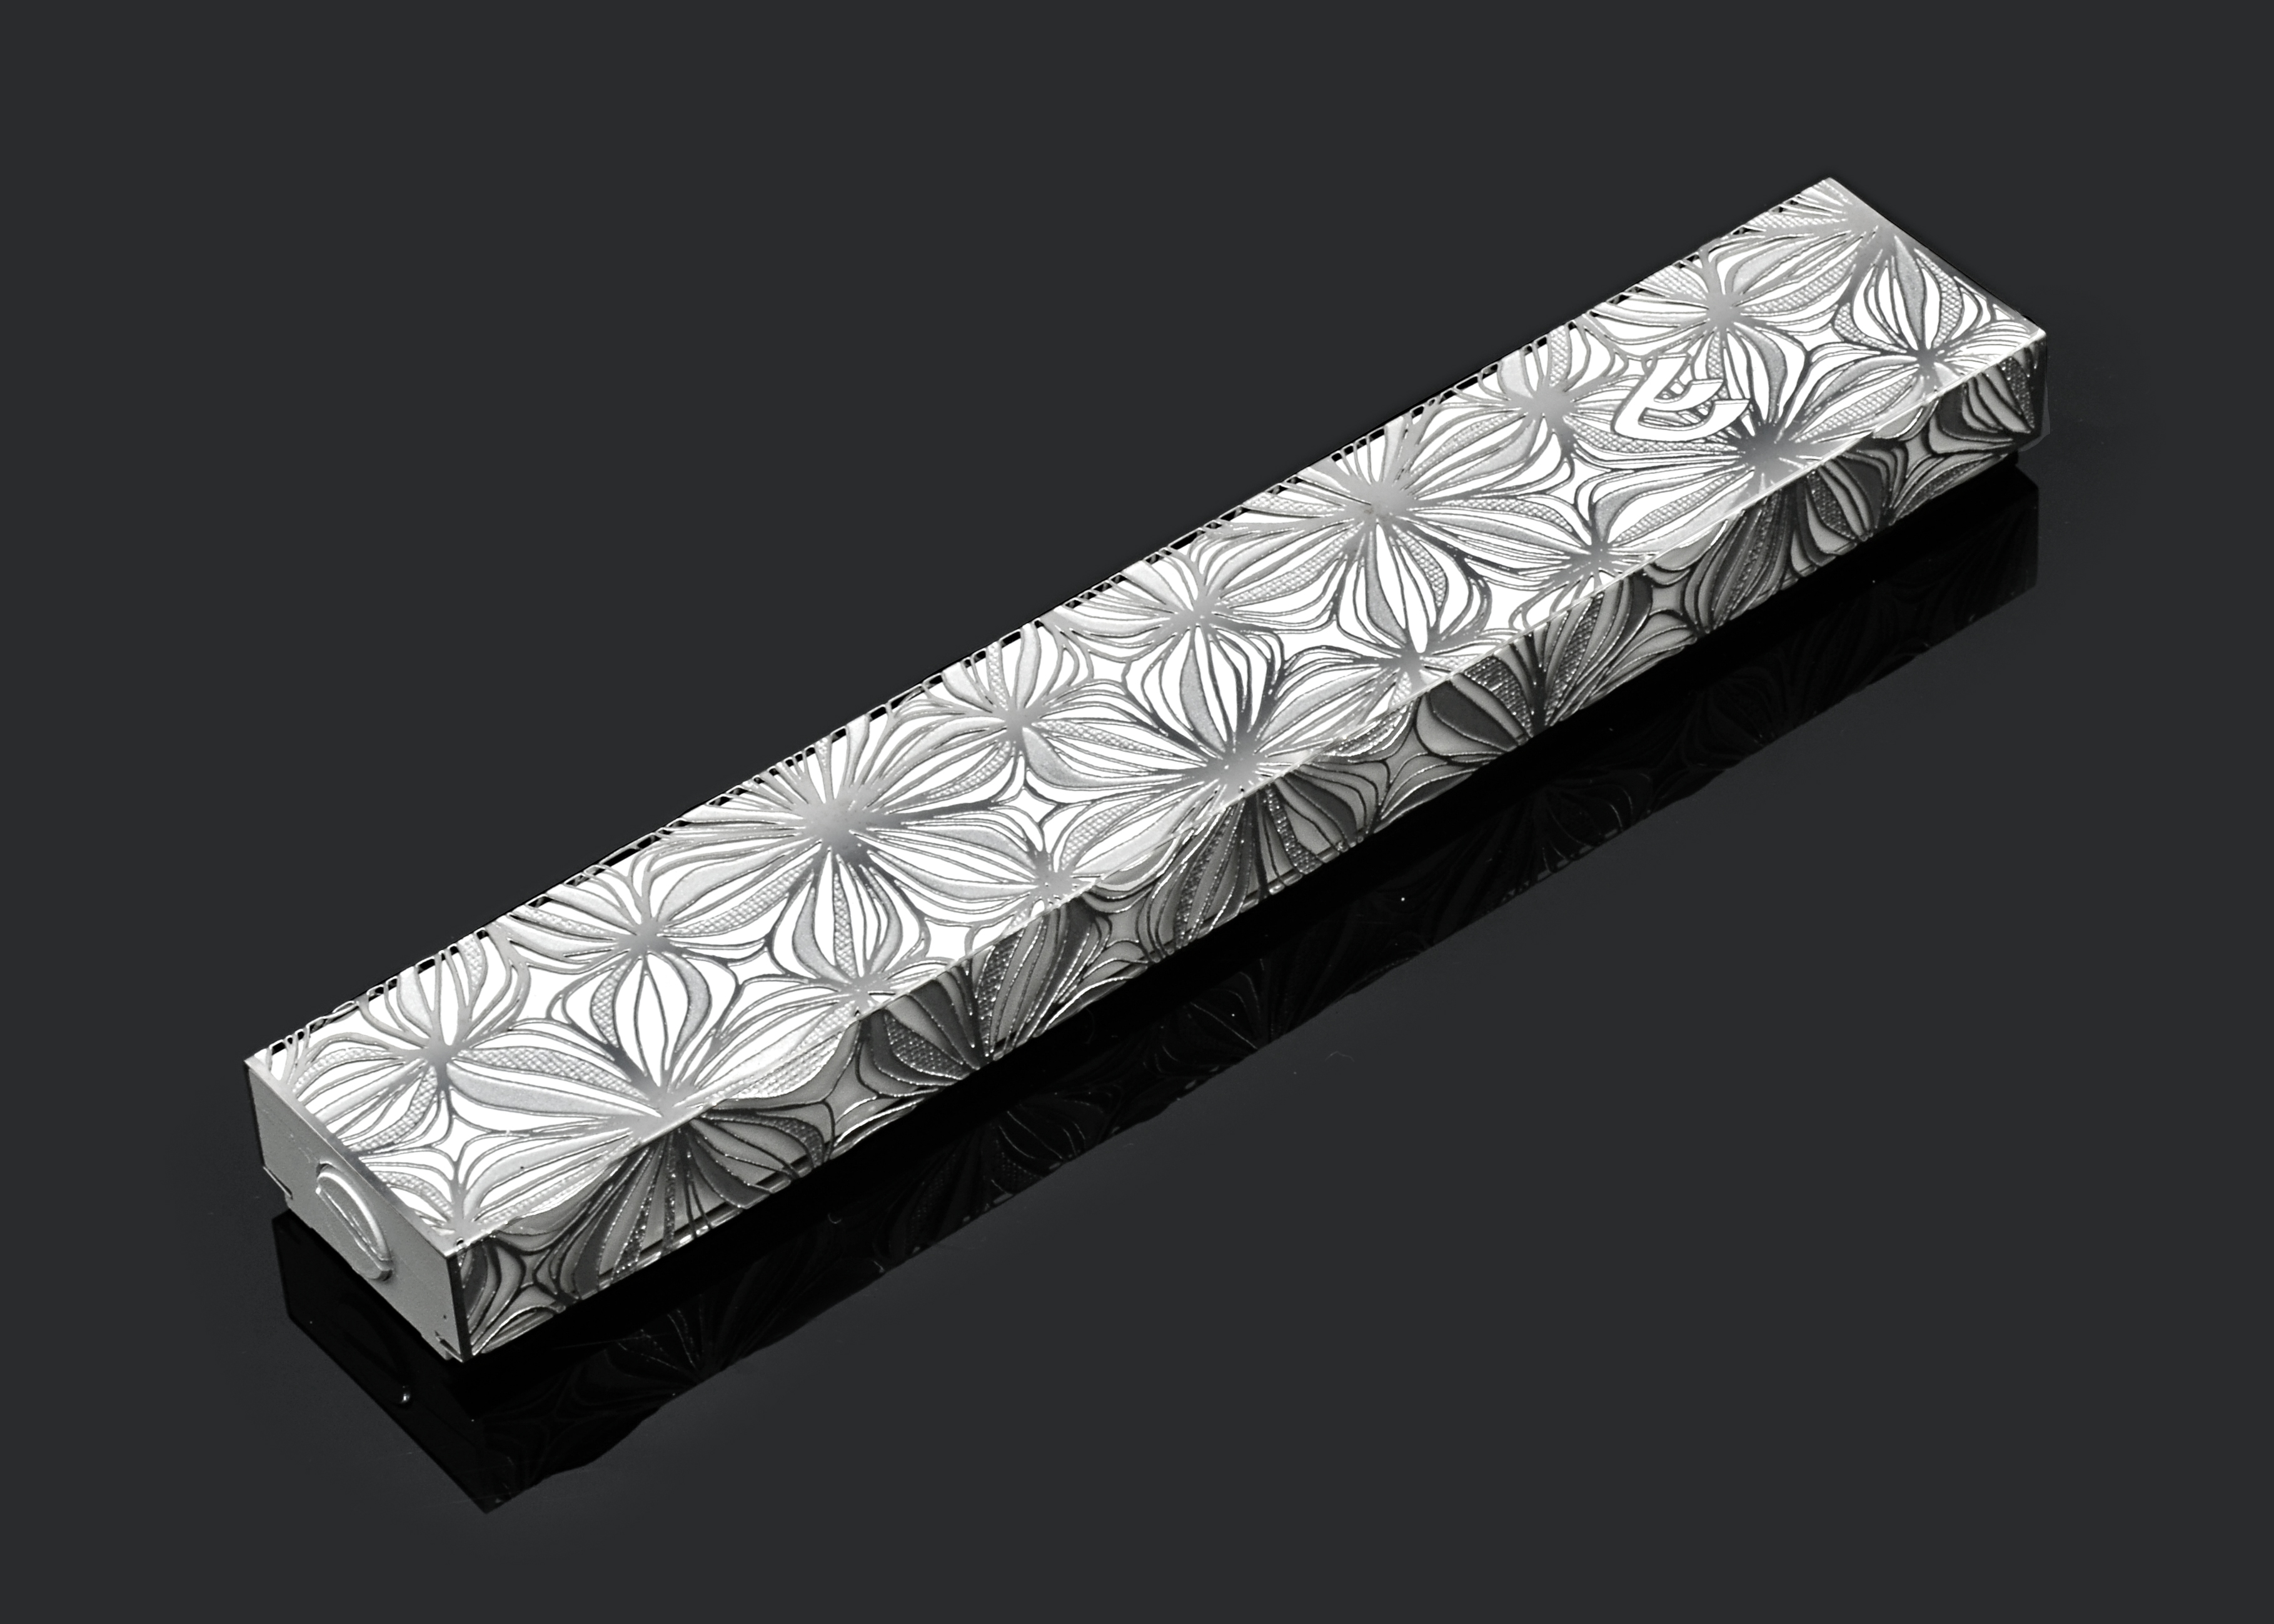 Flower Shadows XL W by Metal Lace Art